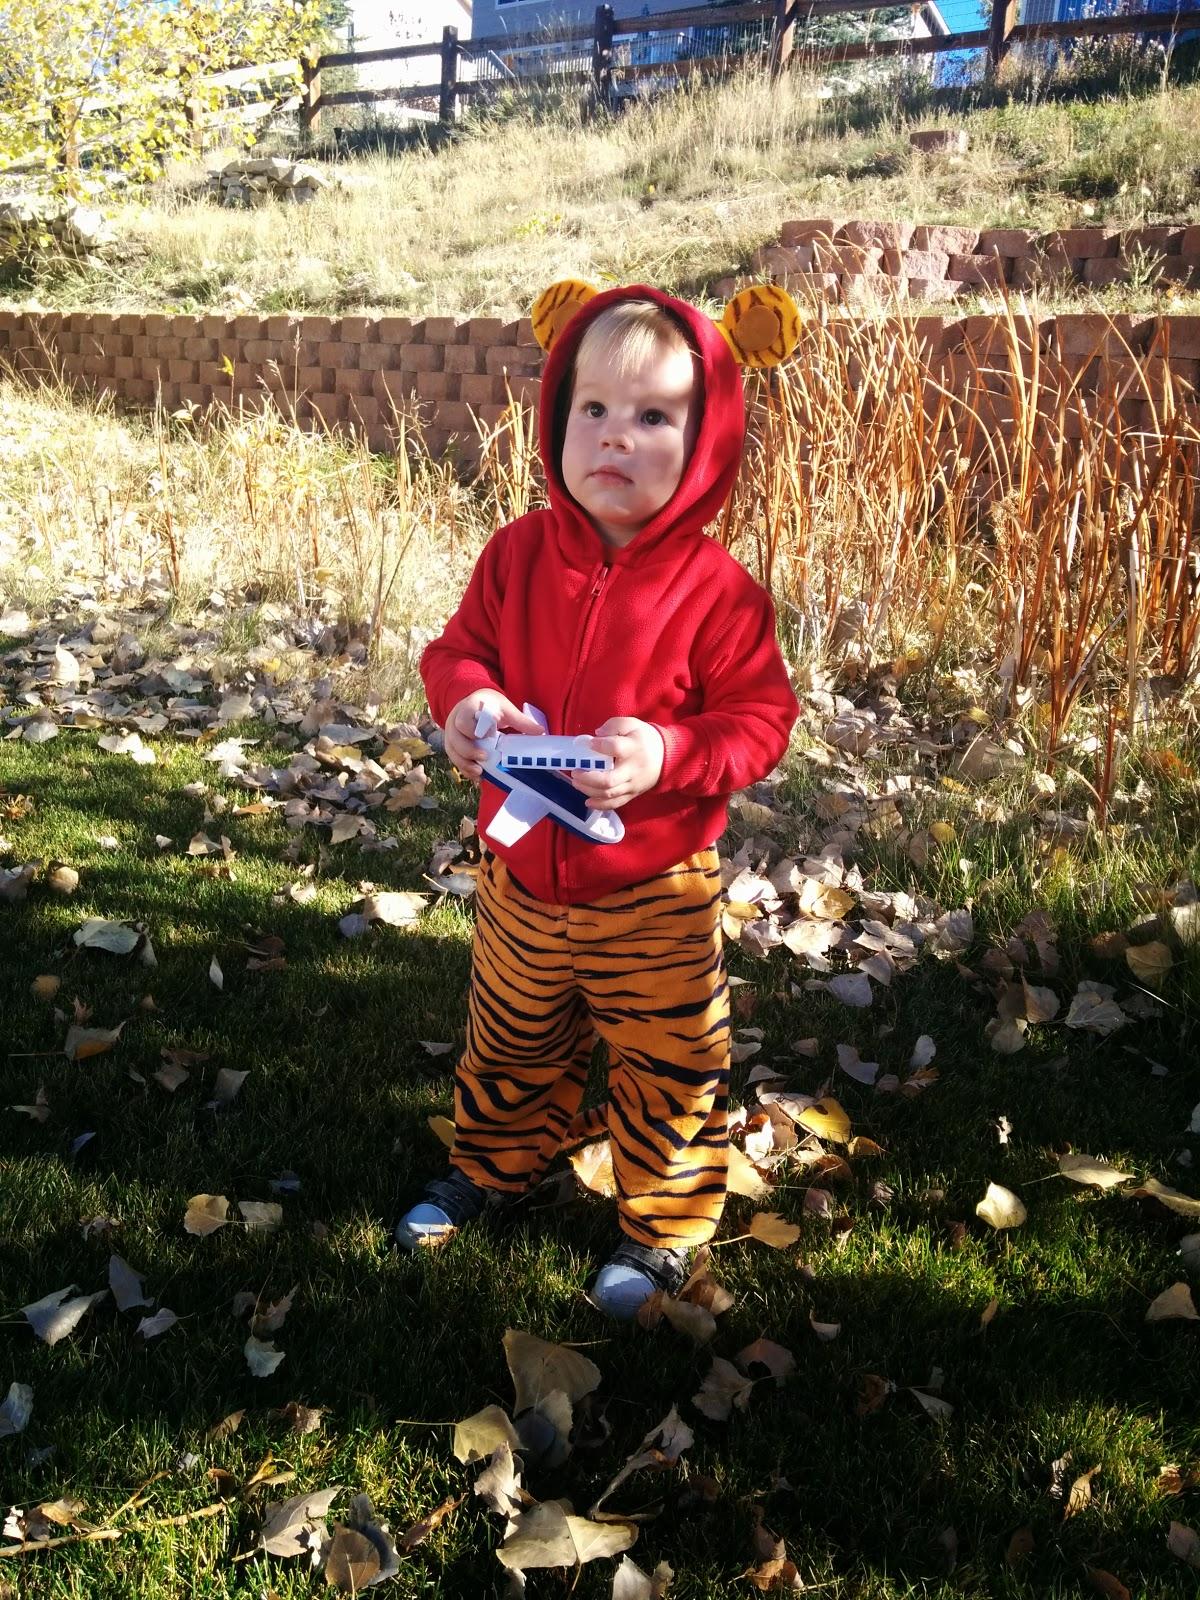 Daniel Tiger Halloween Costume   The Princess And The Pea Daniel Tiger Halloween Costume